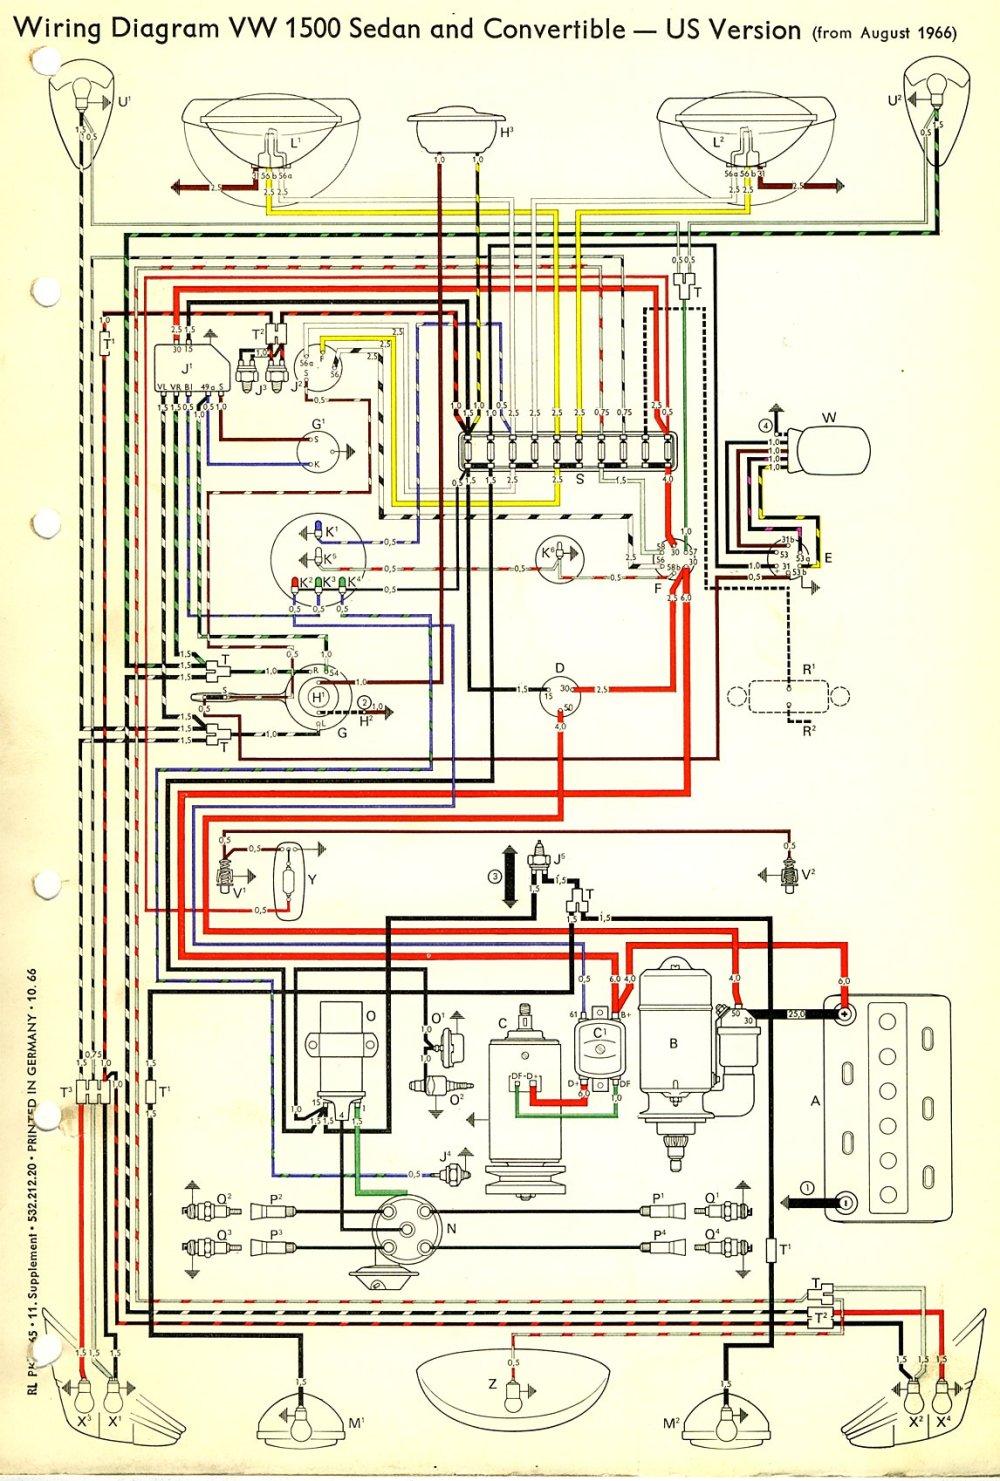 medium resolution of 1998 vw beetle wiring diagram wire rh economiaynegocios co 1971 fuse 1600 1600 vw starter